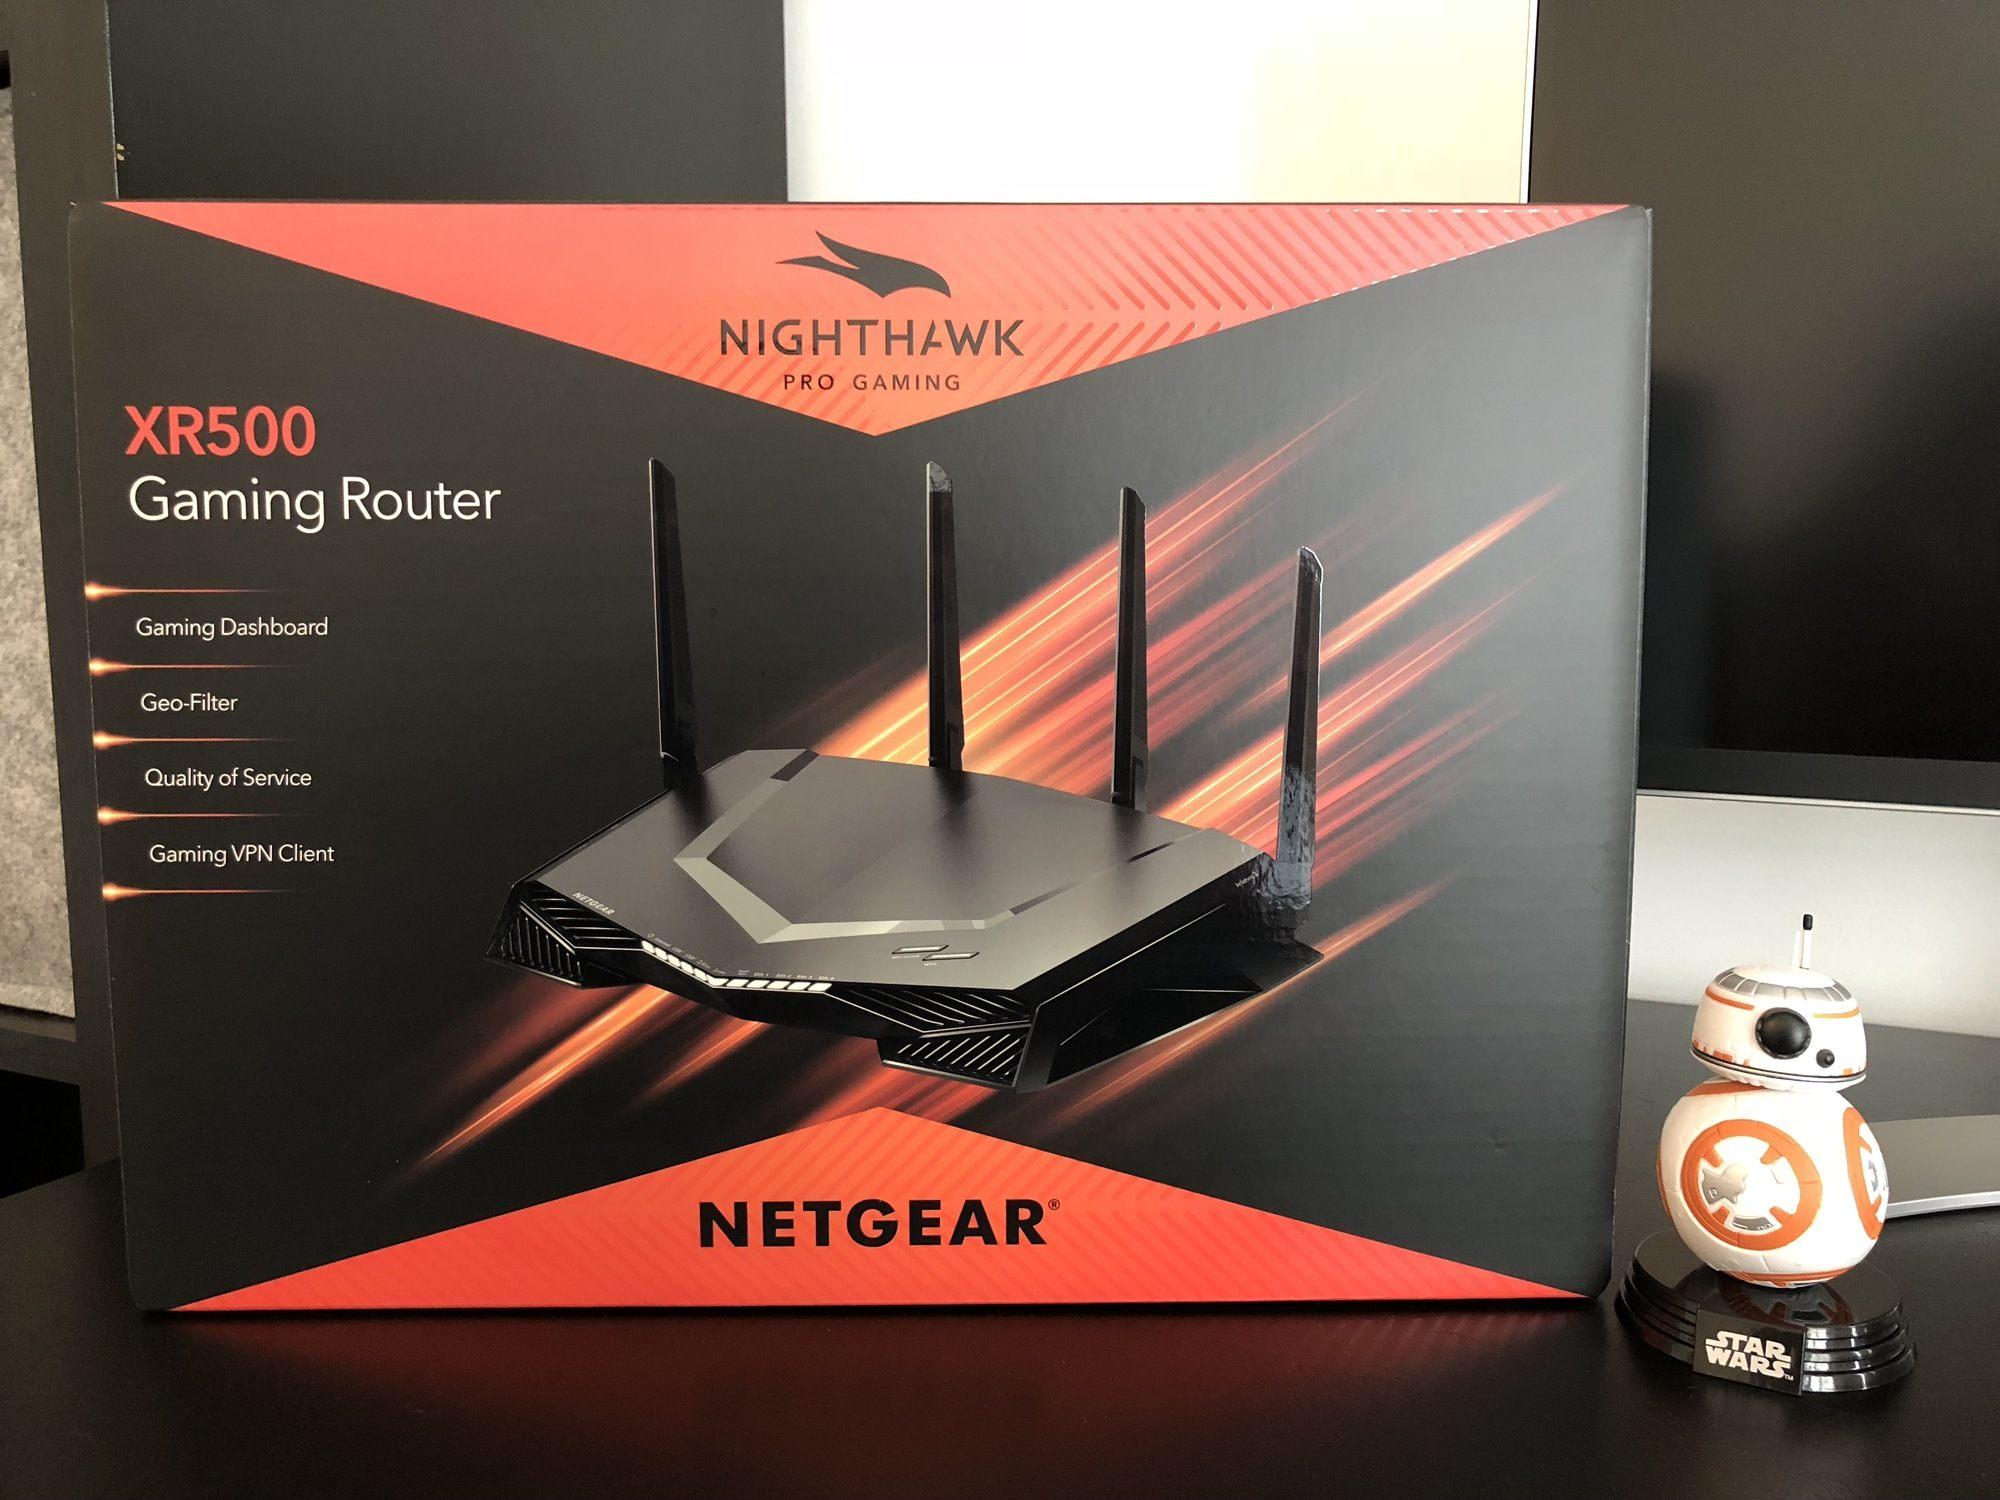 Routeur Netgear XR500